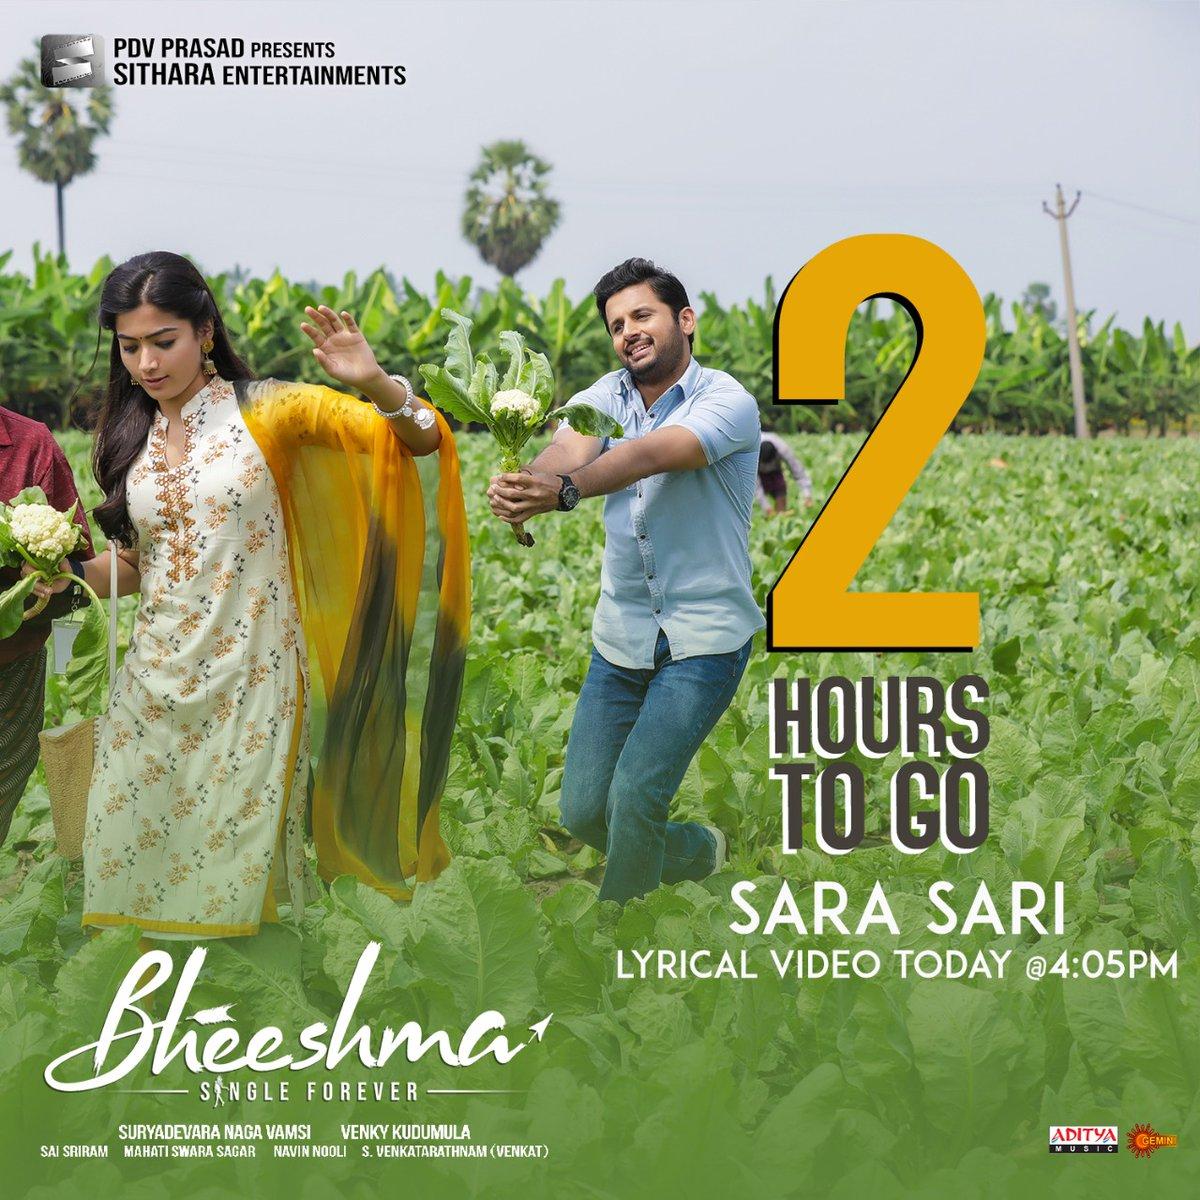 Rashmika Ante Praanam On Twitter 2 Hours To Go For Sarasari Lyrical Video Song Iamrashmika Bheeshma Rashmikasweetymandanna Rashmikamandanna Https T Co Ip7qljx0bs